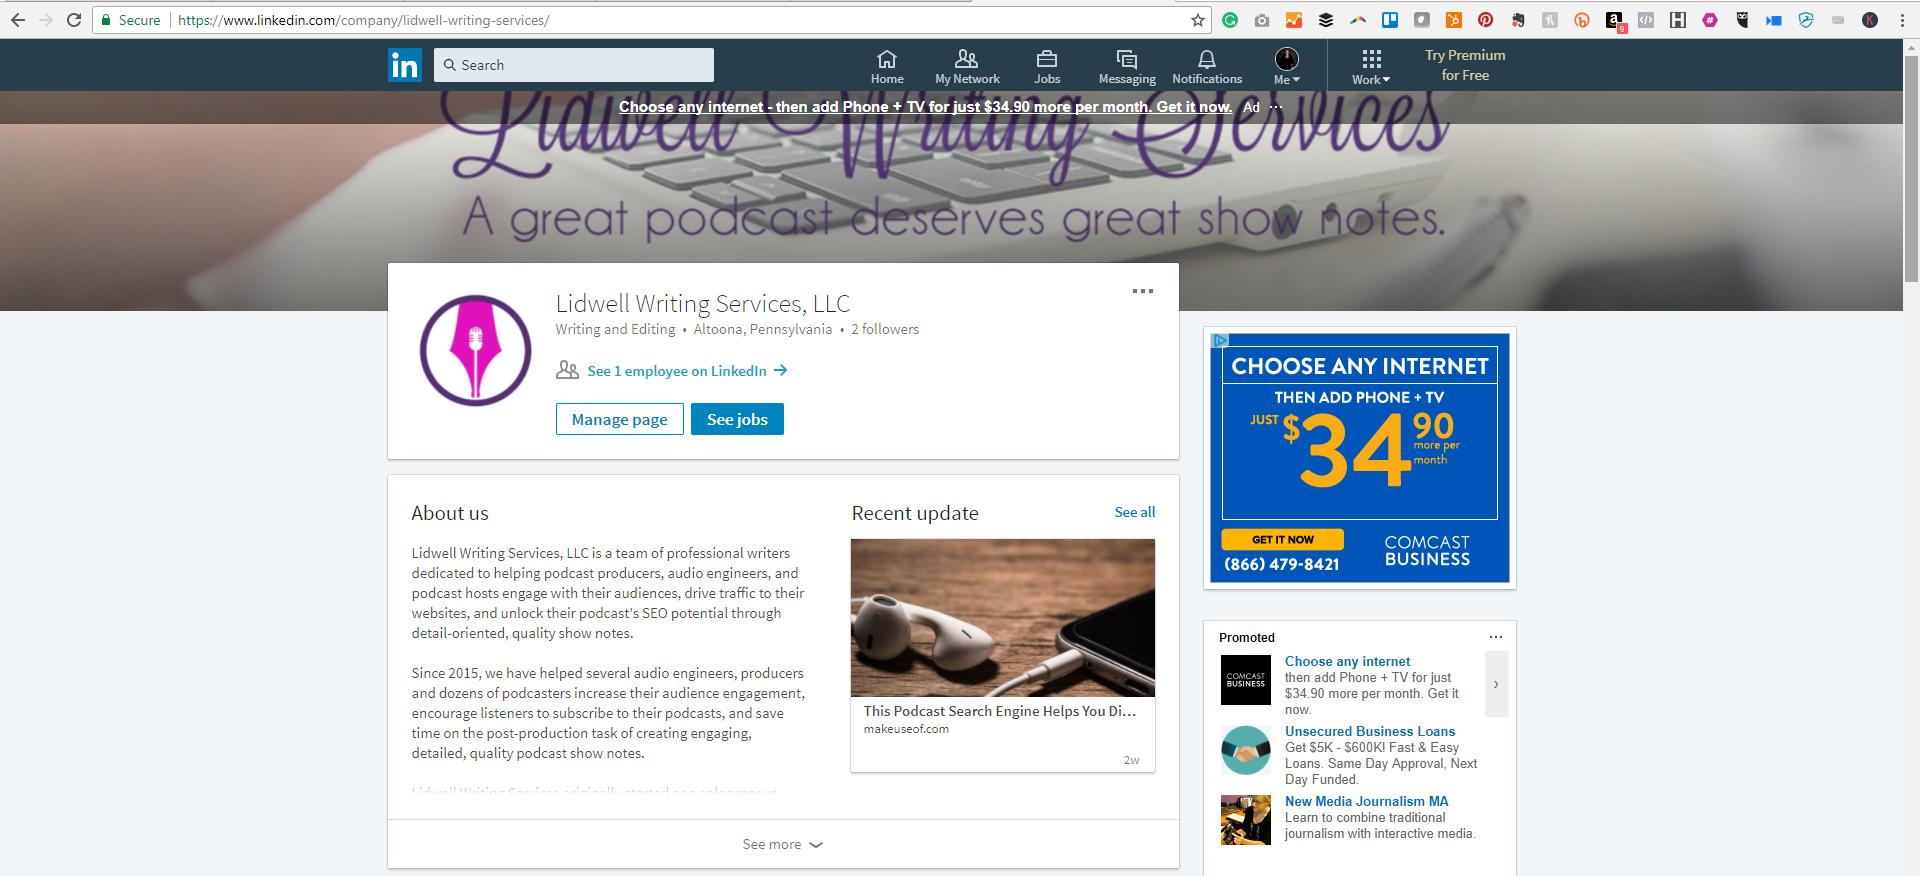 LinkedIn Company Page Screenshot.png